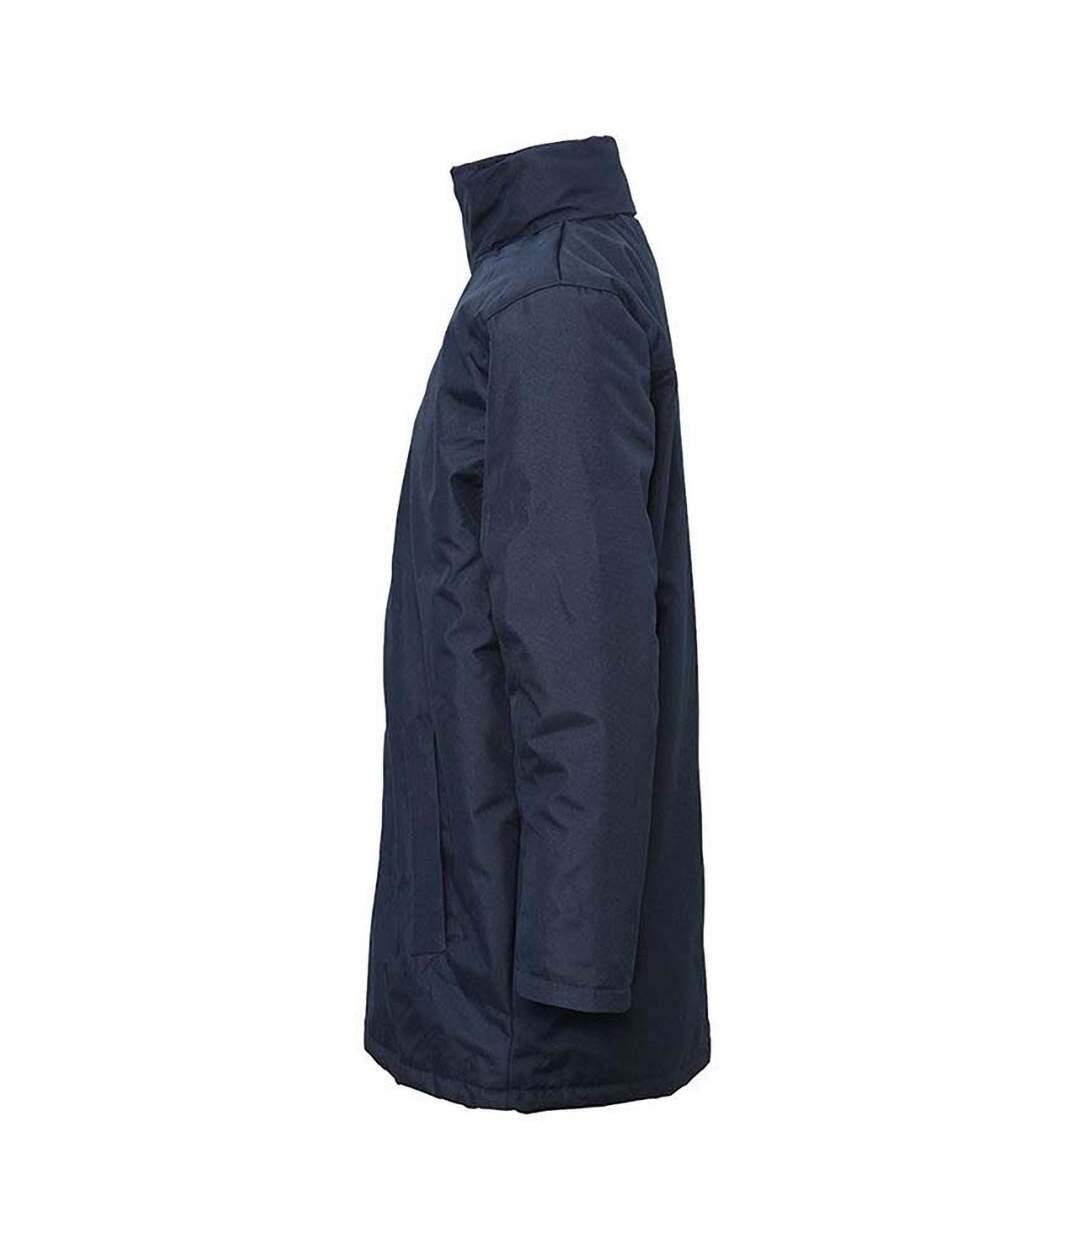 2786 - Veste parka hydrofuge et coupe-vent - Homme (Bleu marine) - UTRW2505